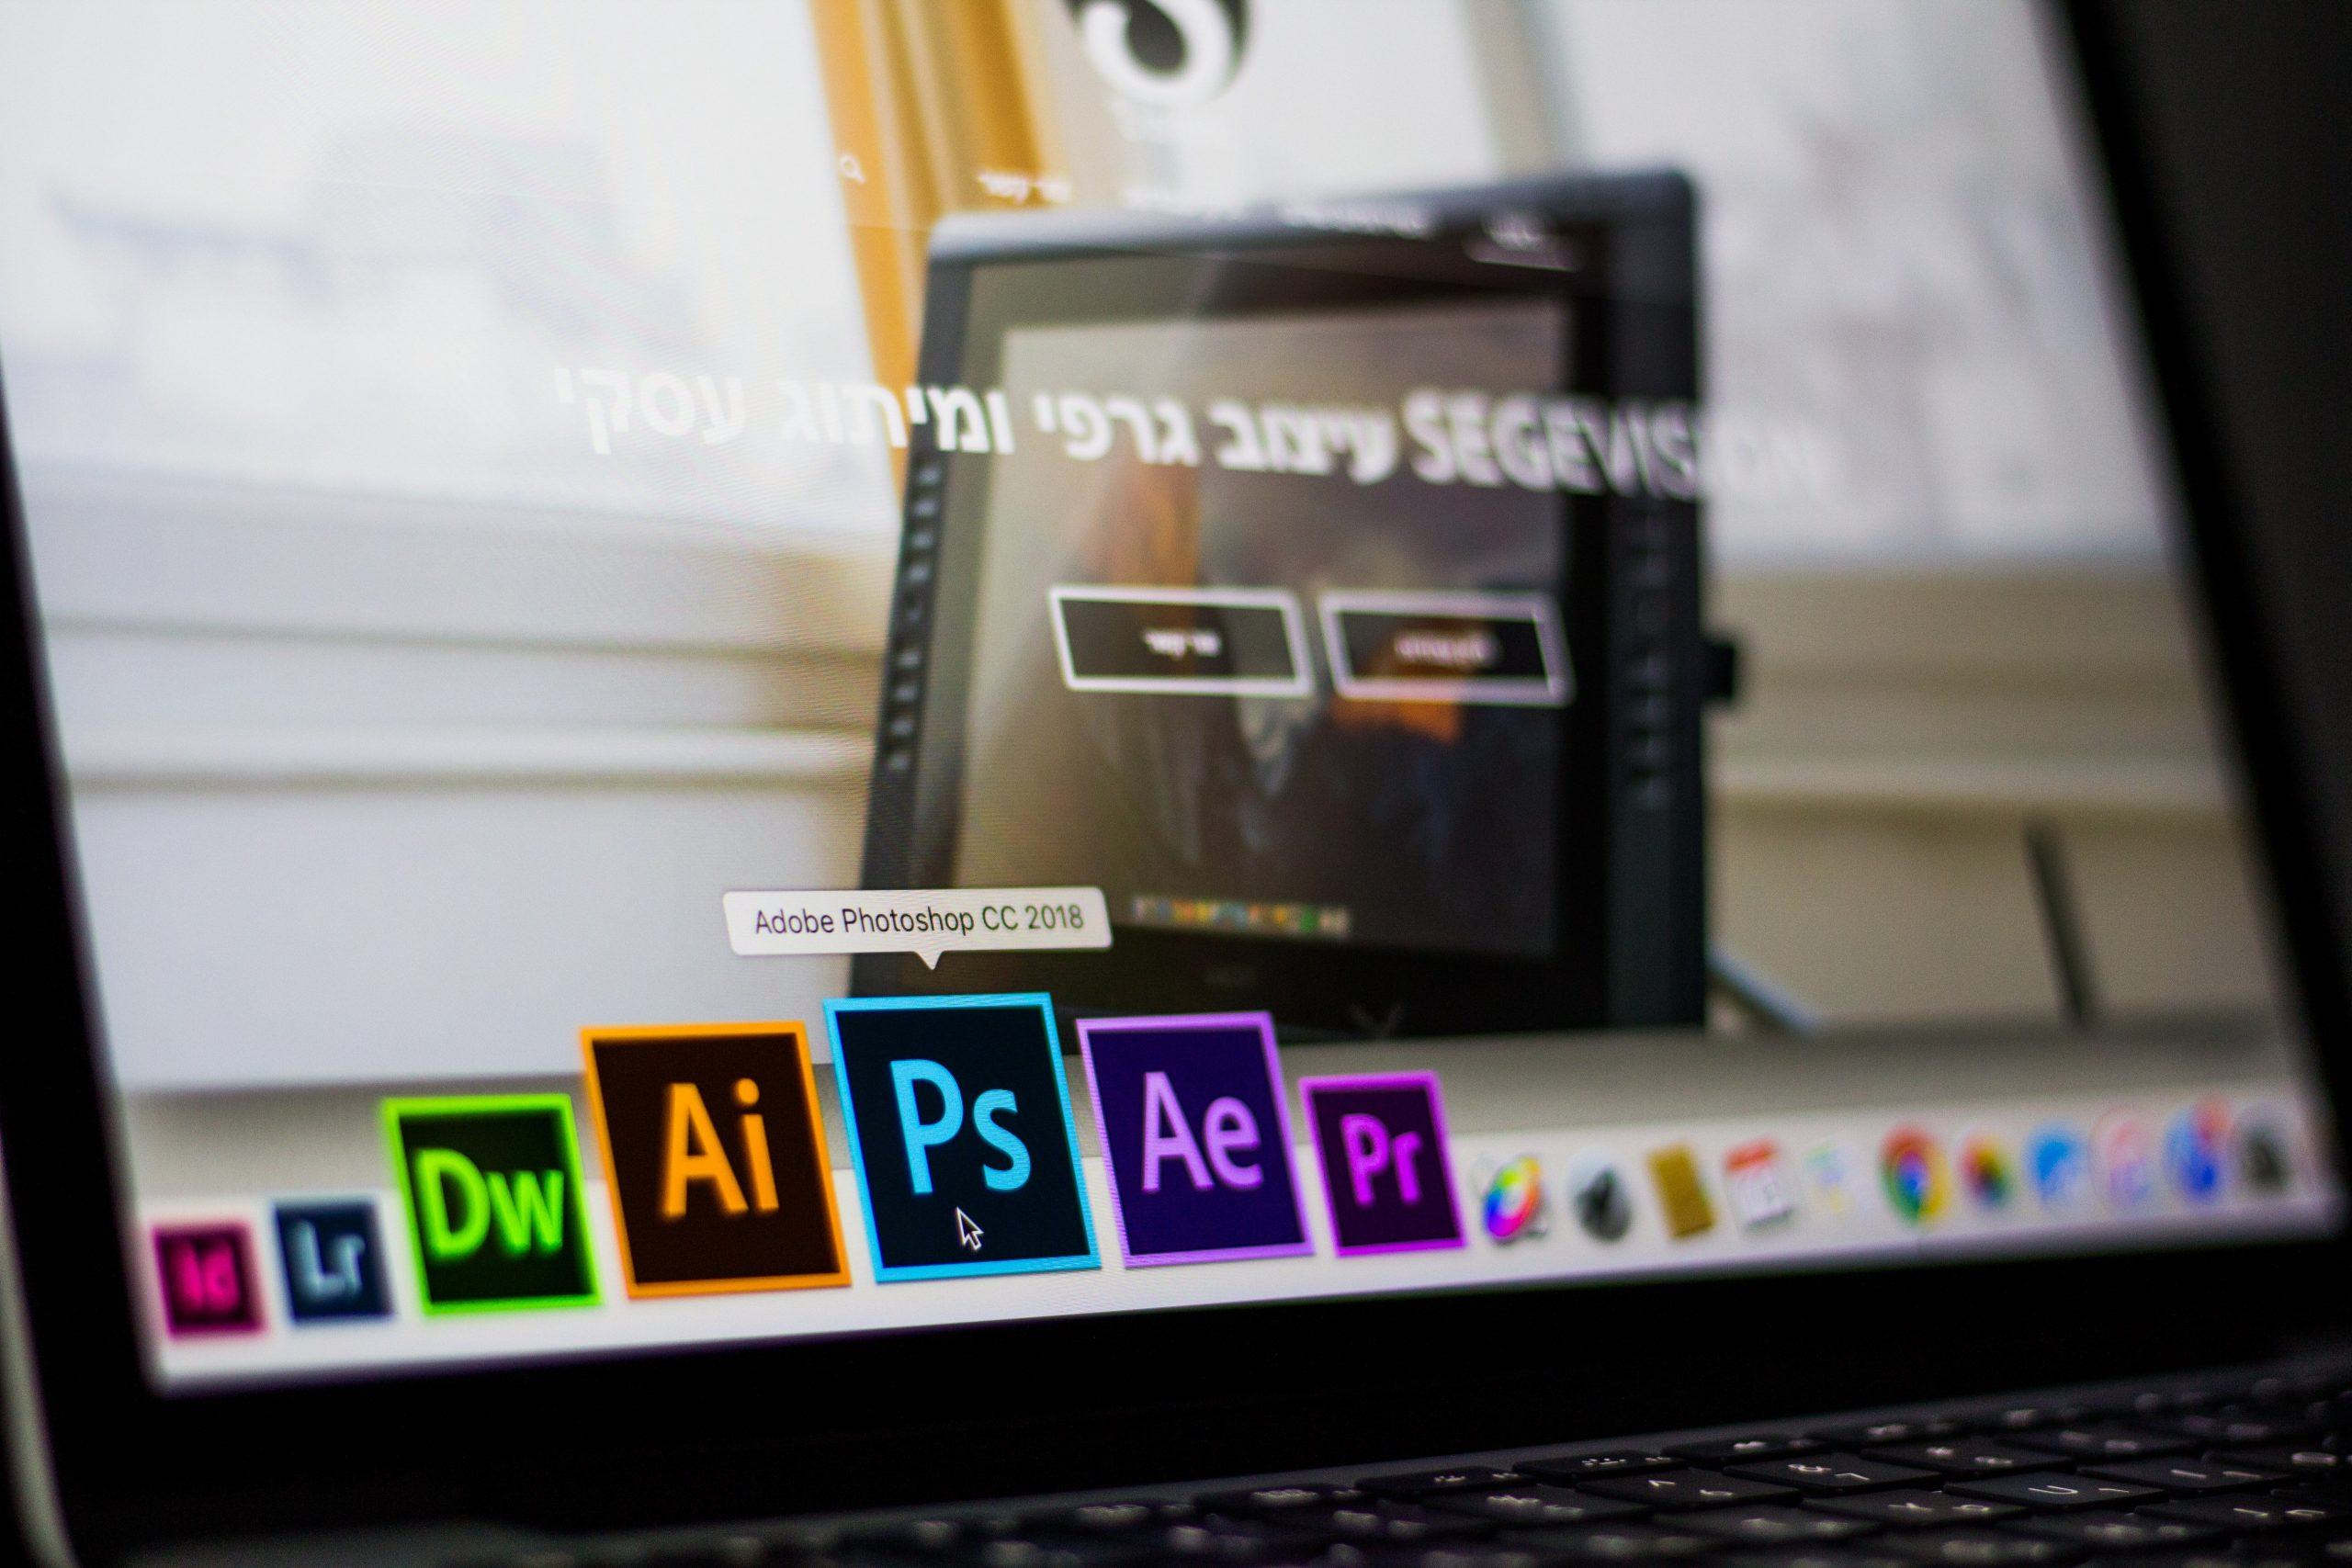 adobe photoshop cc 2018 price in malaysia